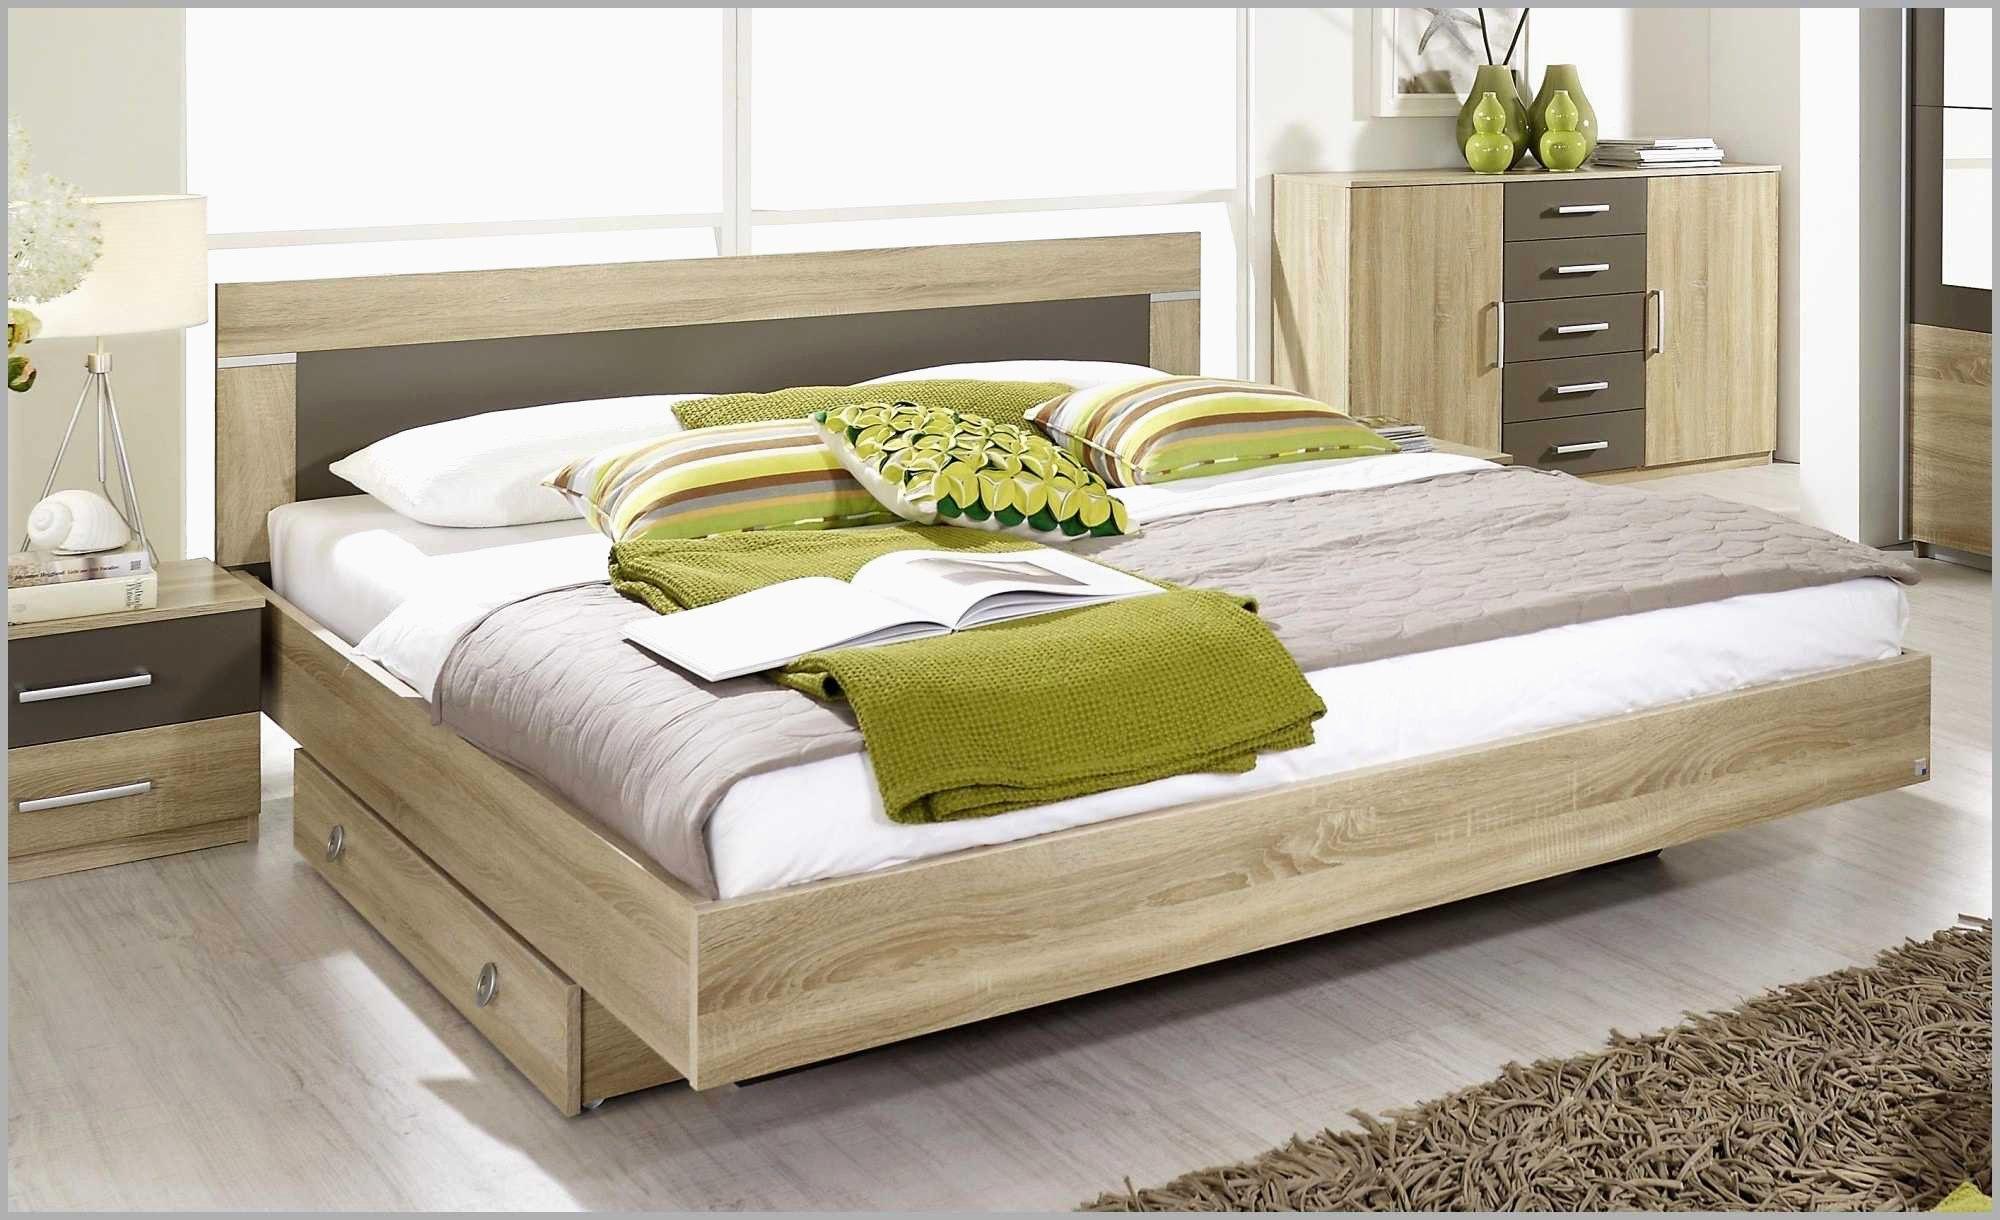 Tete De Lit 180 Ikea Luxe Tete De Lit Bois 180 Tete De Lit Ikea 180 Fauteuil Salon Ikea Fresh